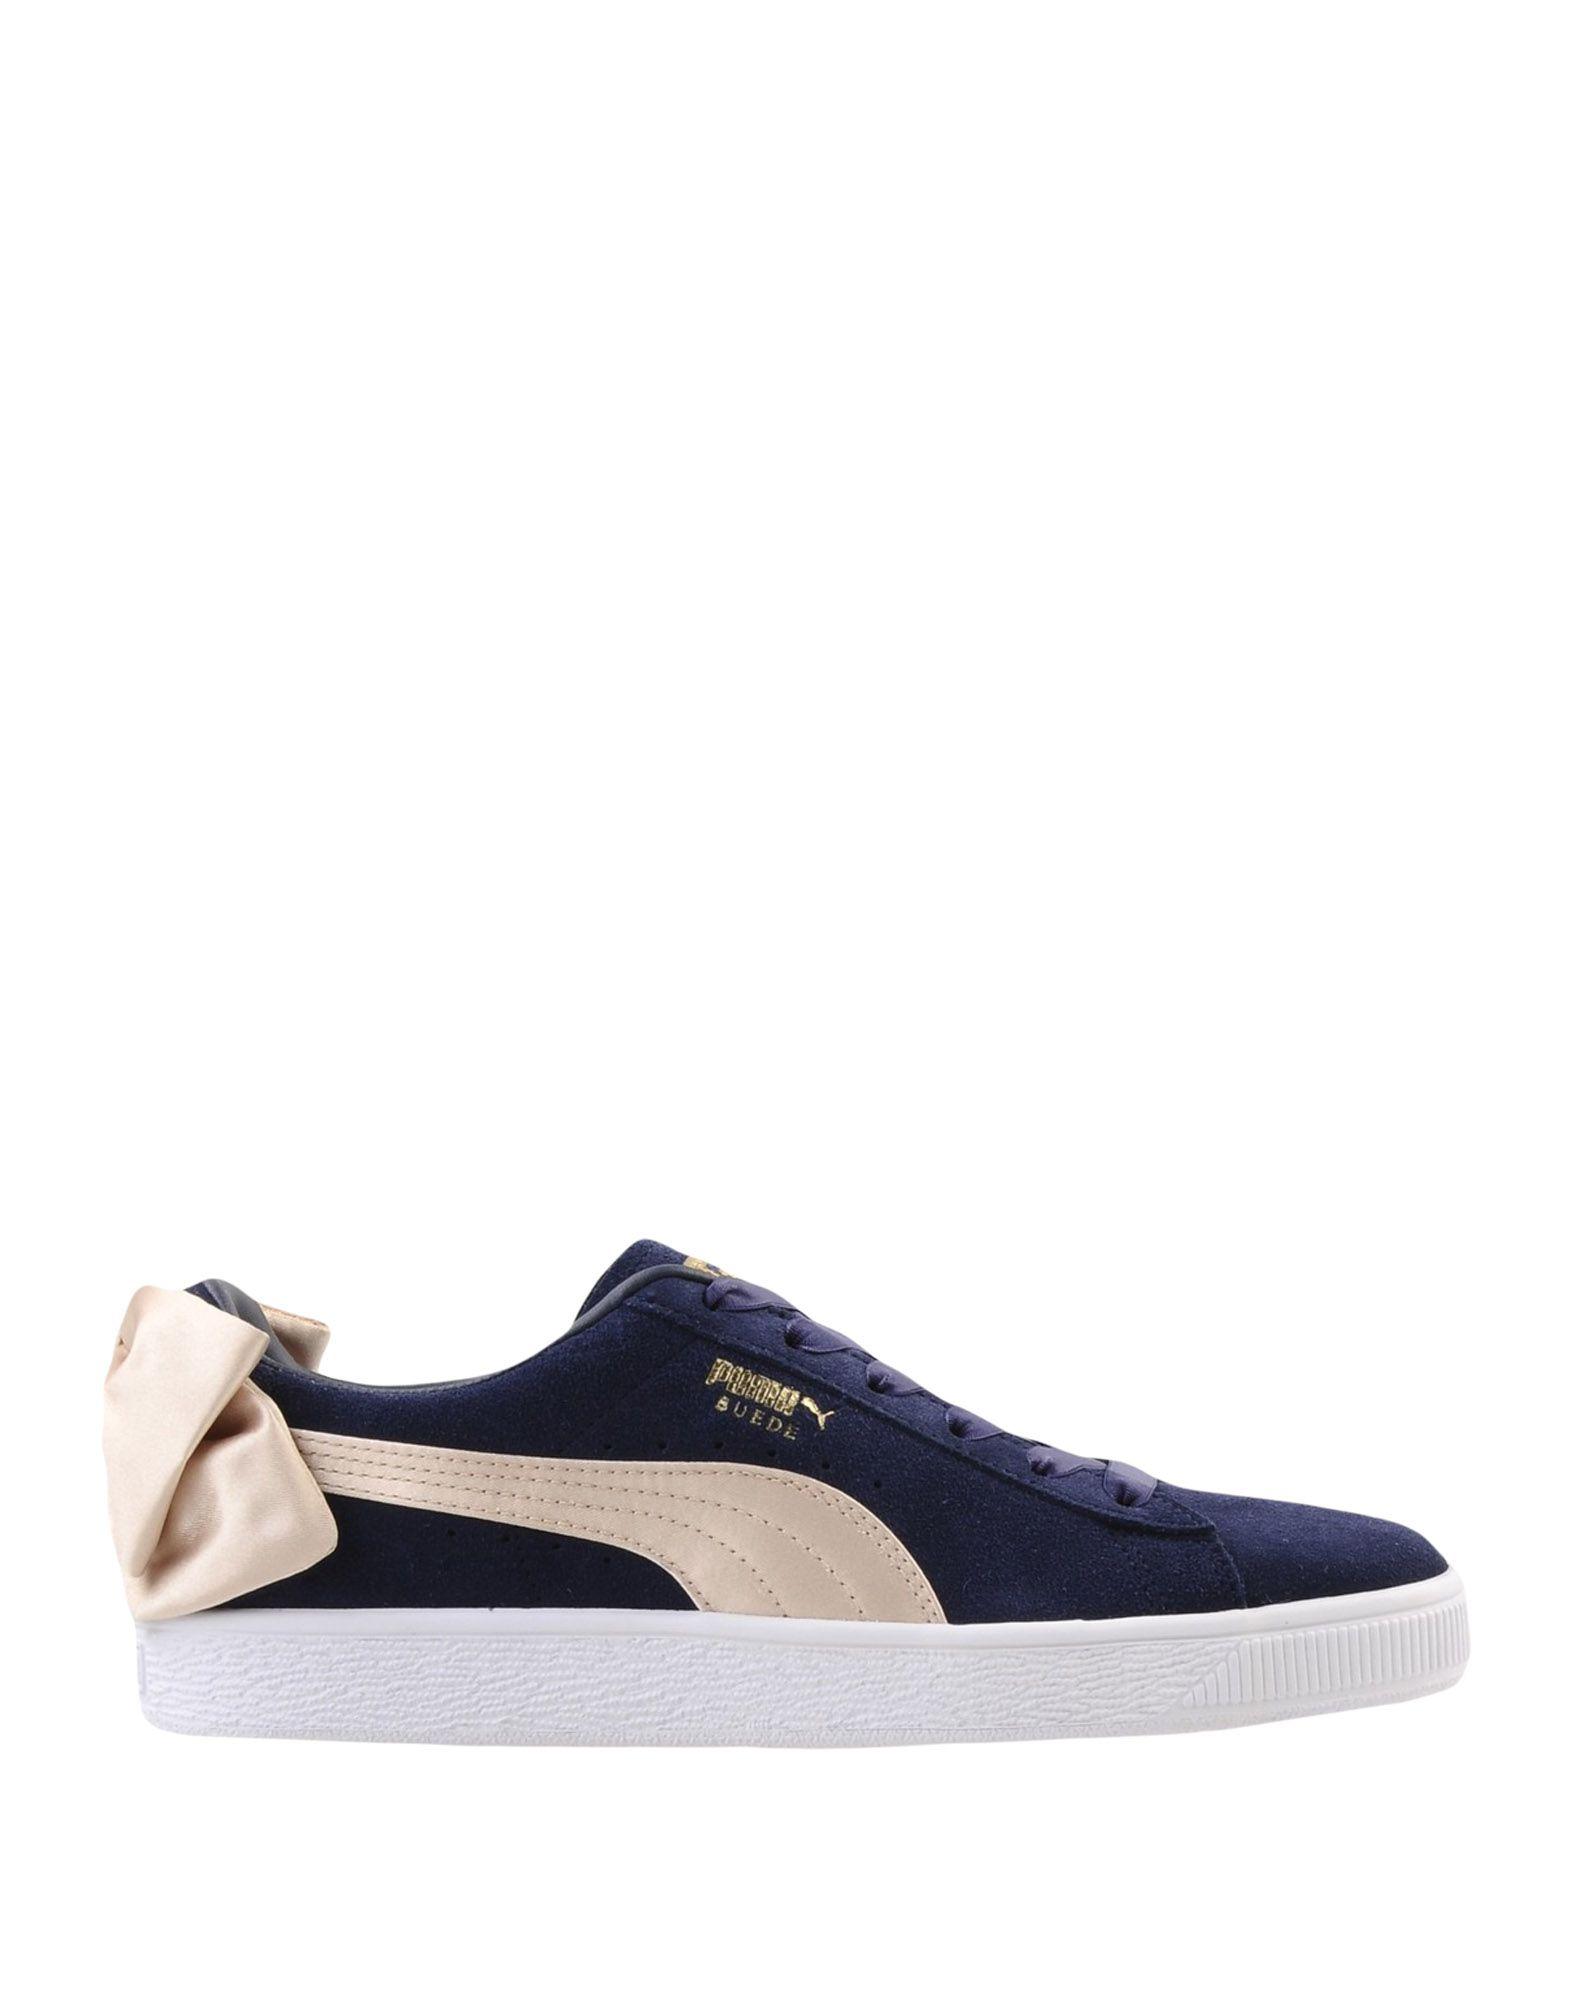 Puma Suede Bow Varsity Wn's Puma - Sneakers - Women Puma Wn's Sneakers online on  Australia - 11566960VK b78e1a